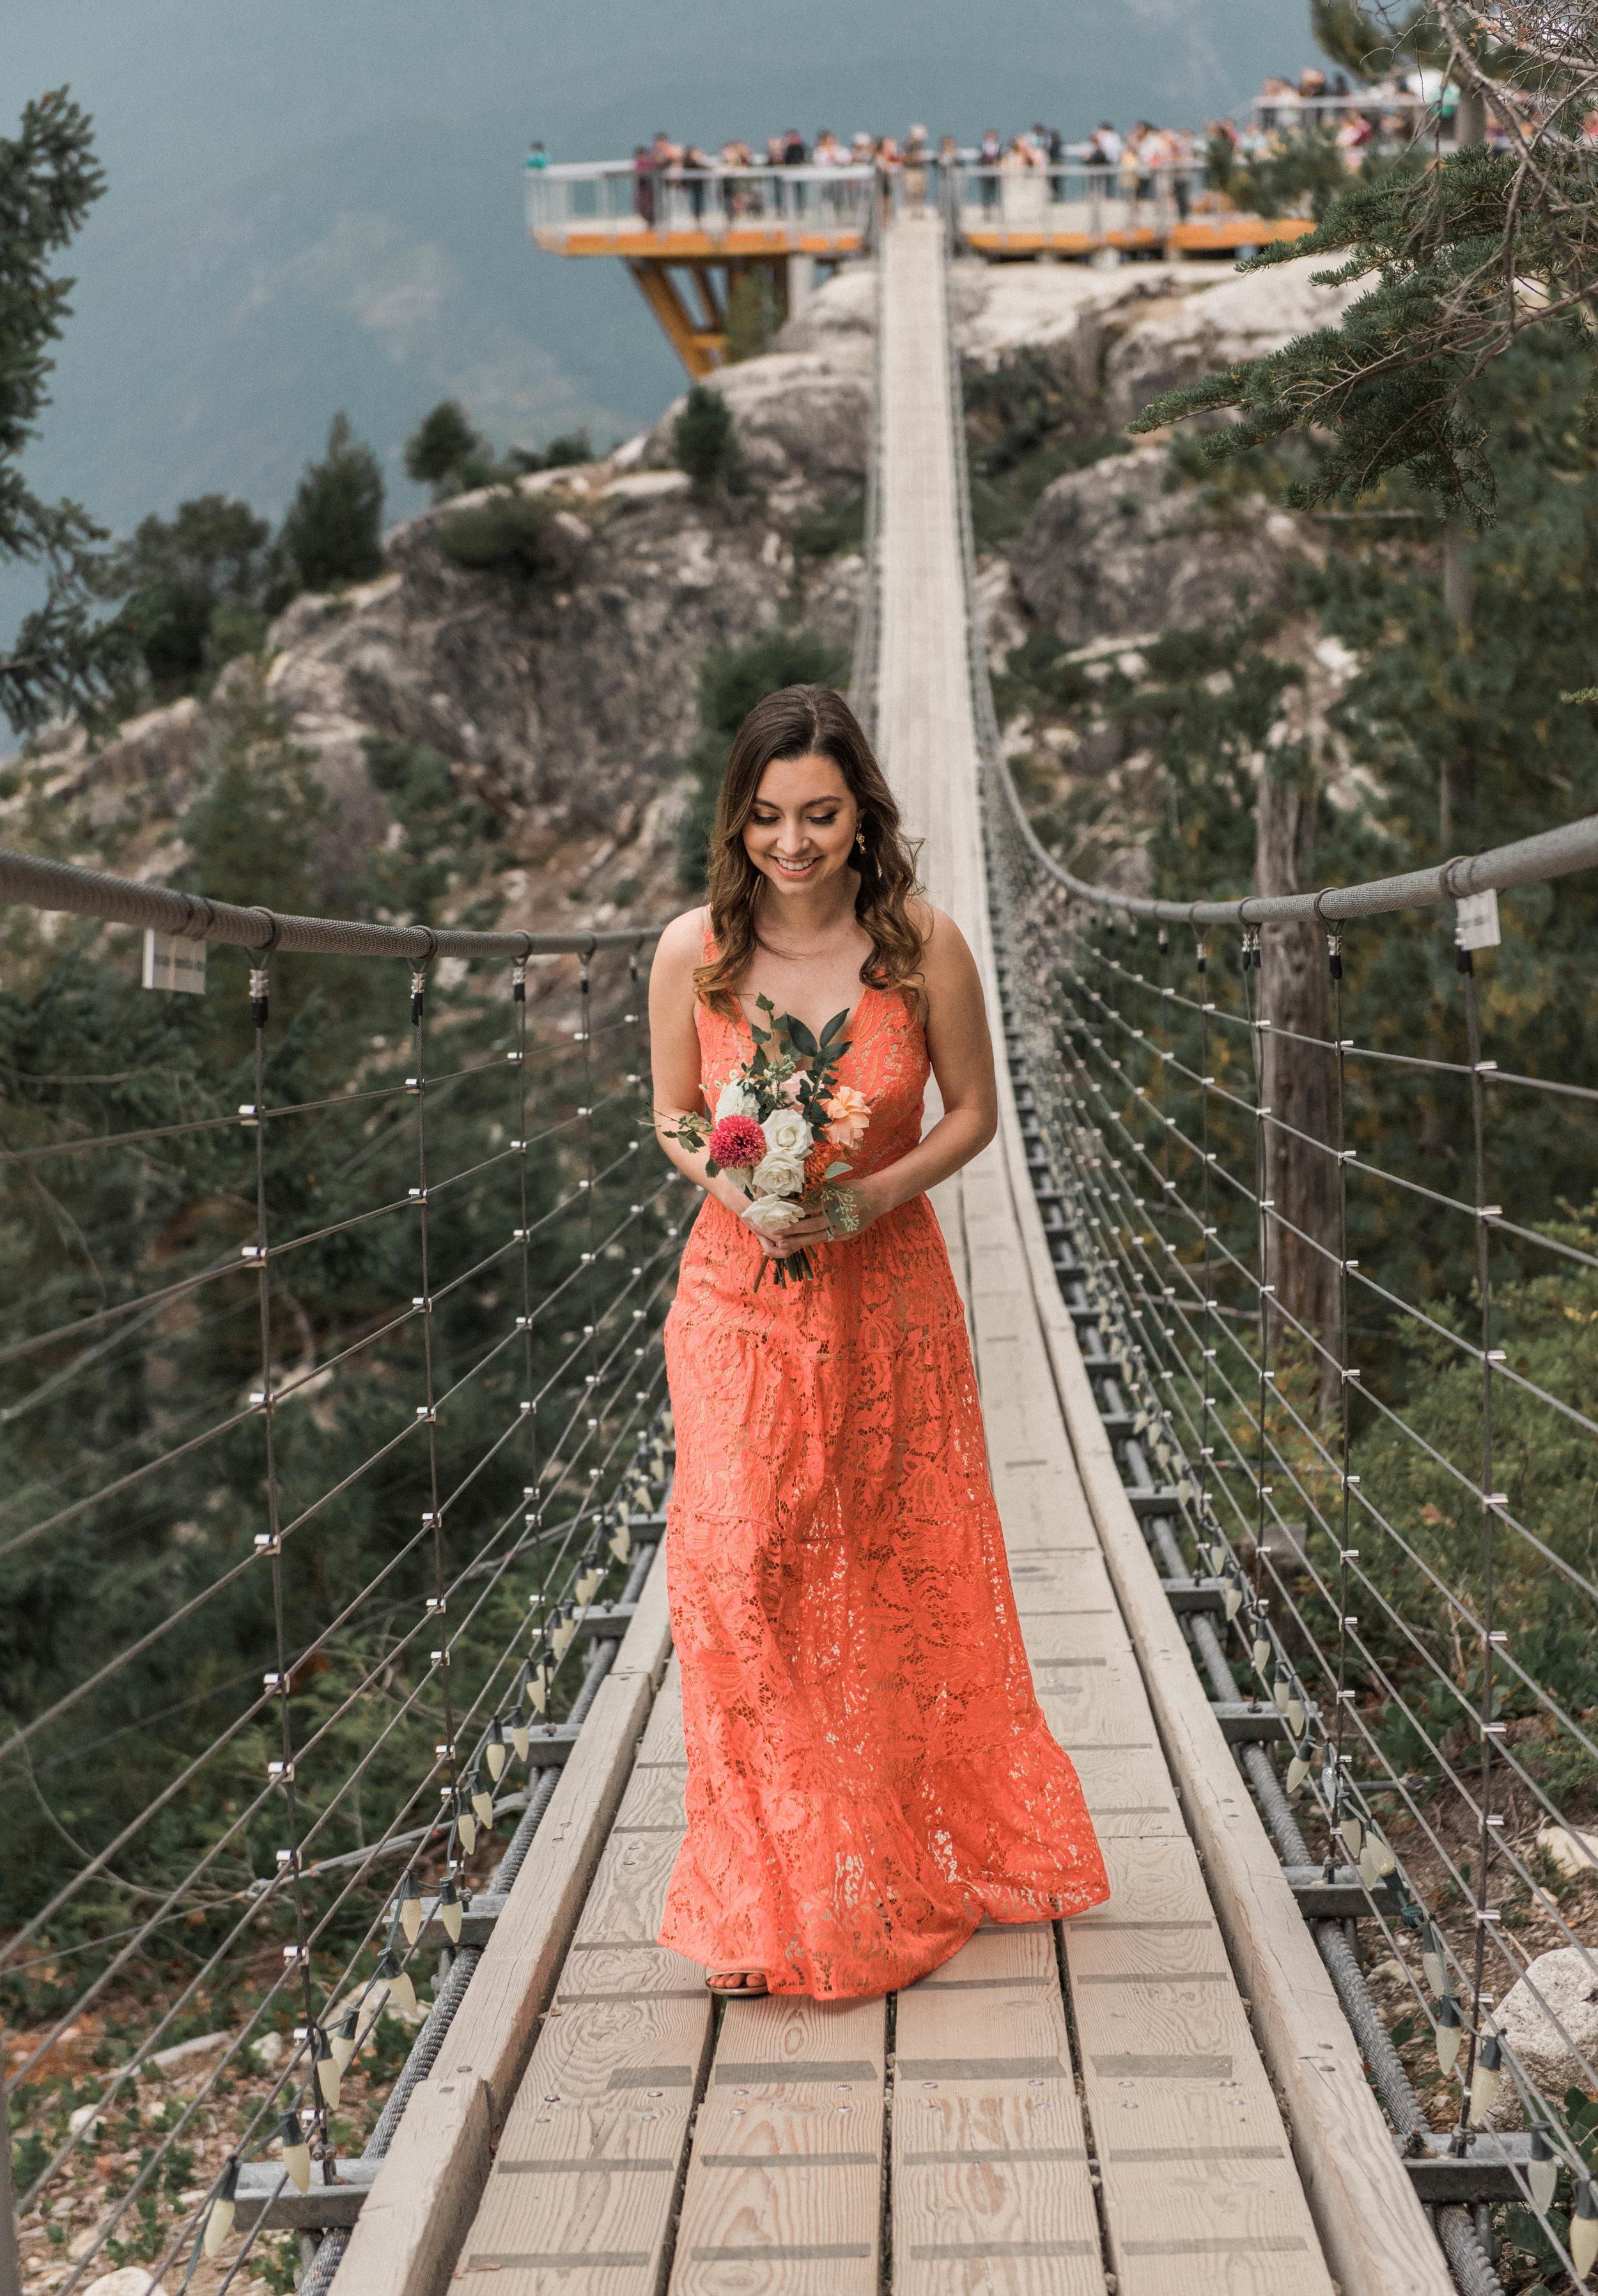 austin-texas-wedding-photography-1778-photographie-76.jpg